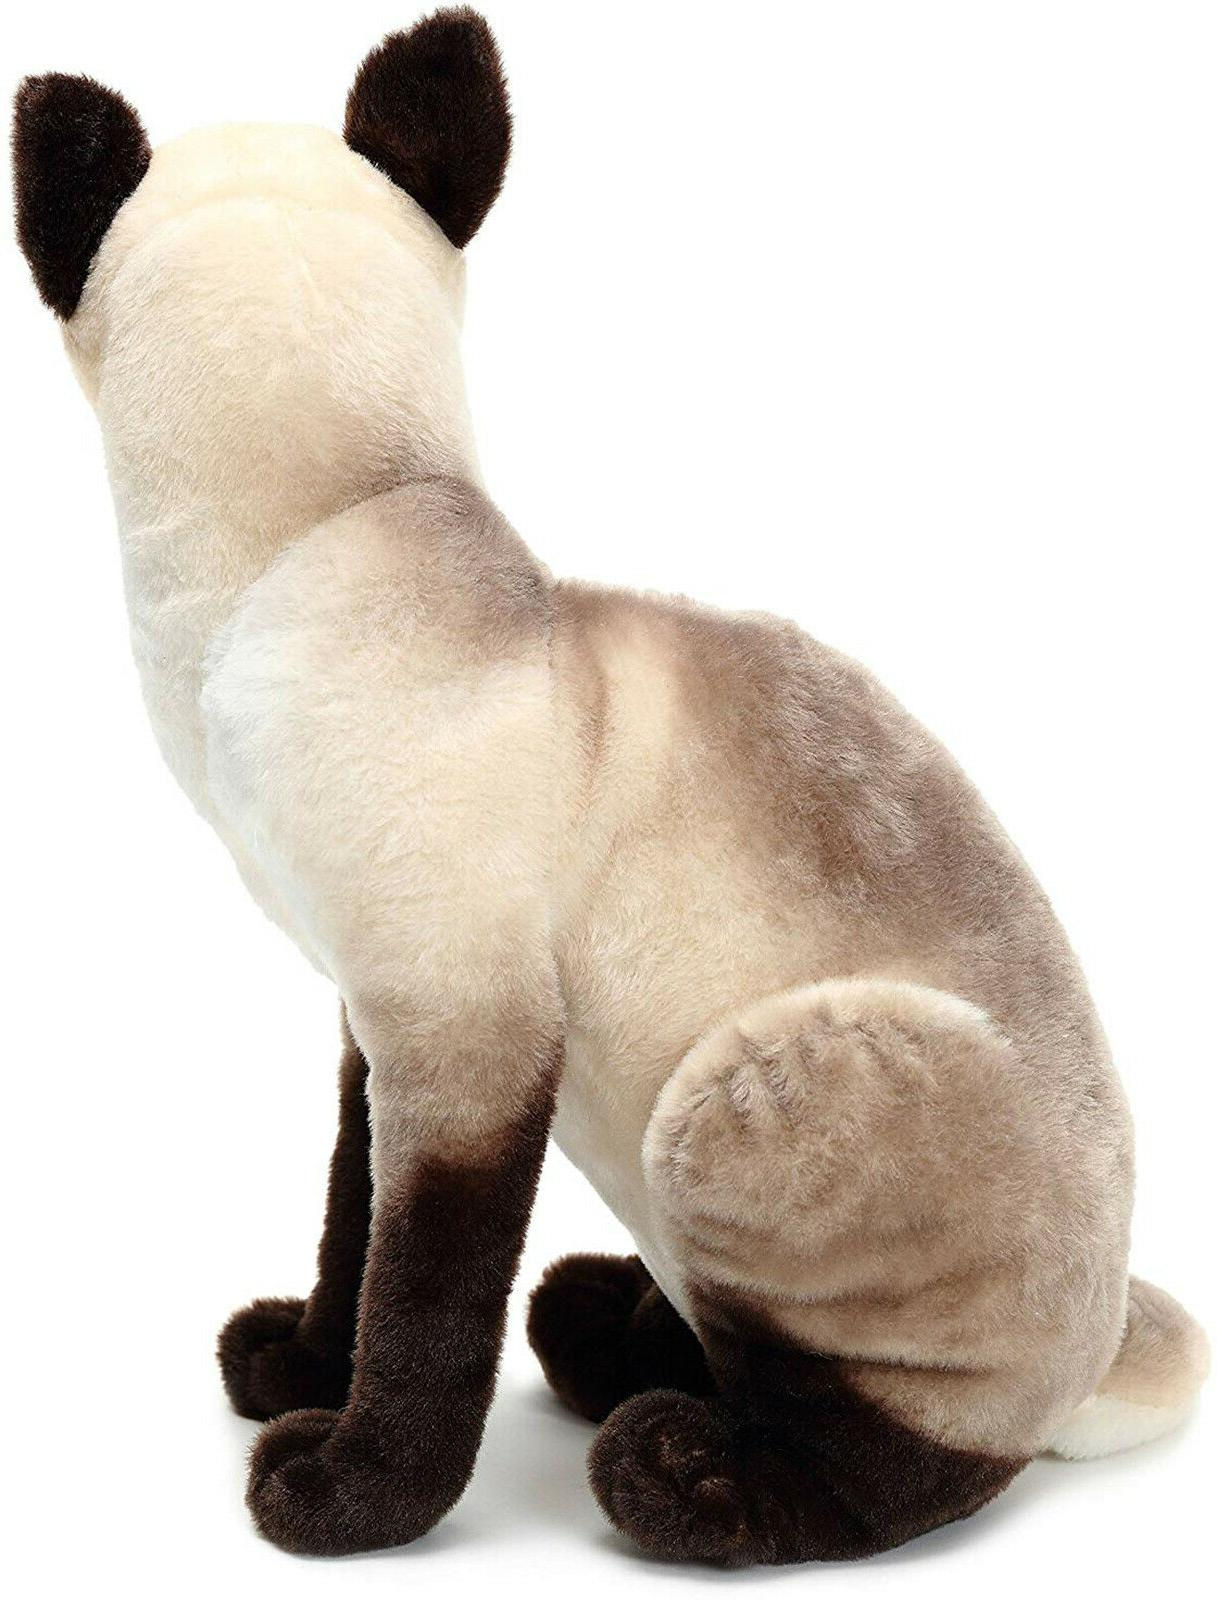 Realistic Cat Pet Plush, Kids And Children Stuffed Animal Toy Gift